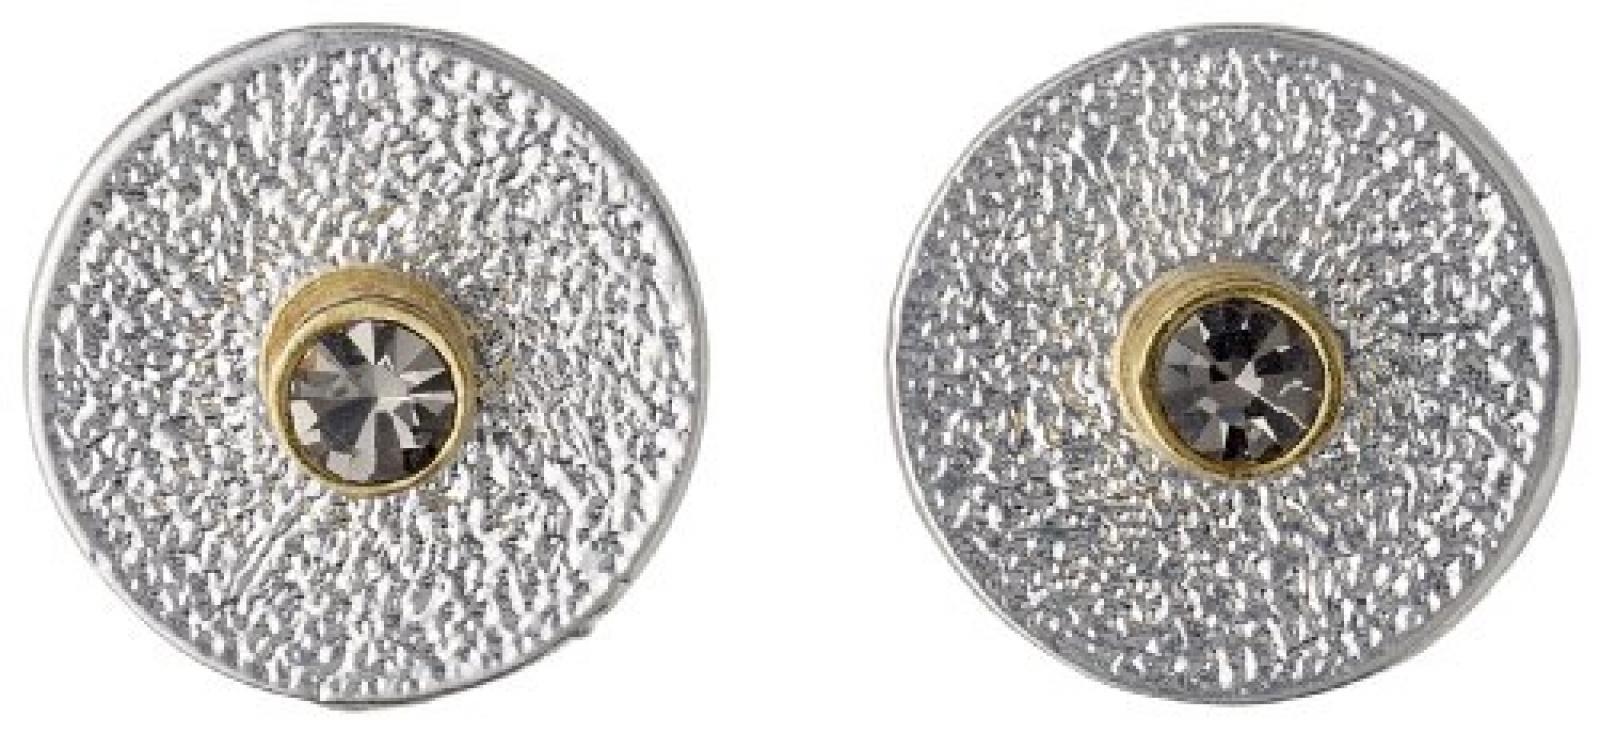 Pilgrim Jewelry Damen-Ohrstecker Messing Pilgrim Damen-Ohrstecker aus der Serie Disk post versilbert,grau 2 in 1 post earring ,1.2 cm in diameter cm 451336103